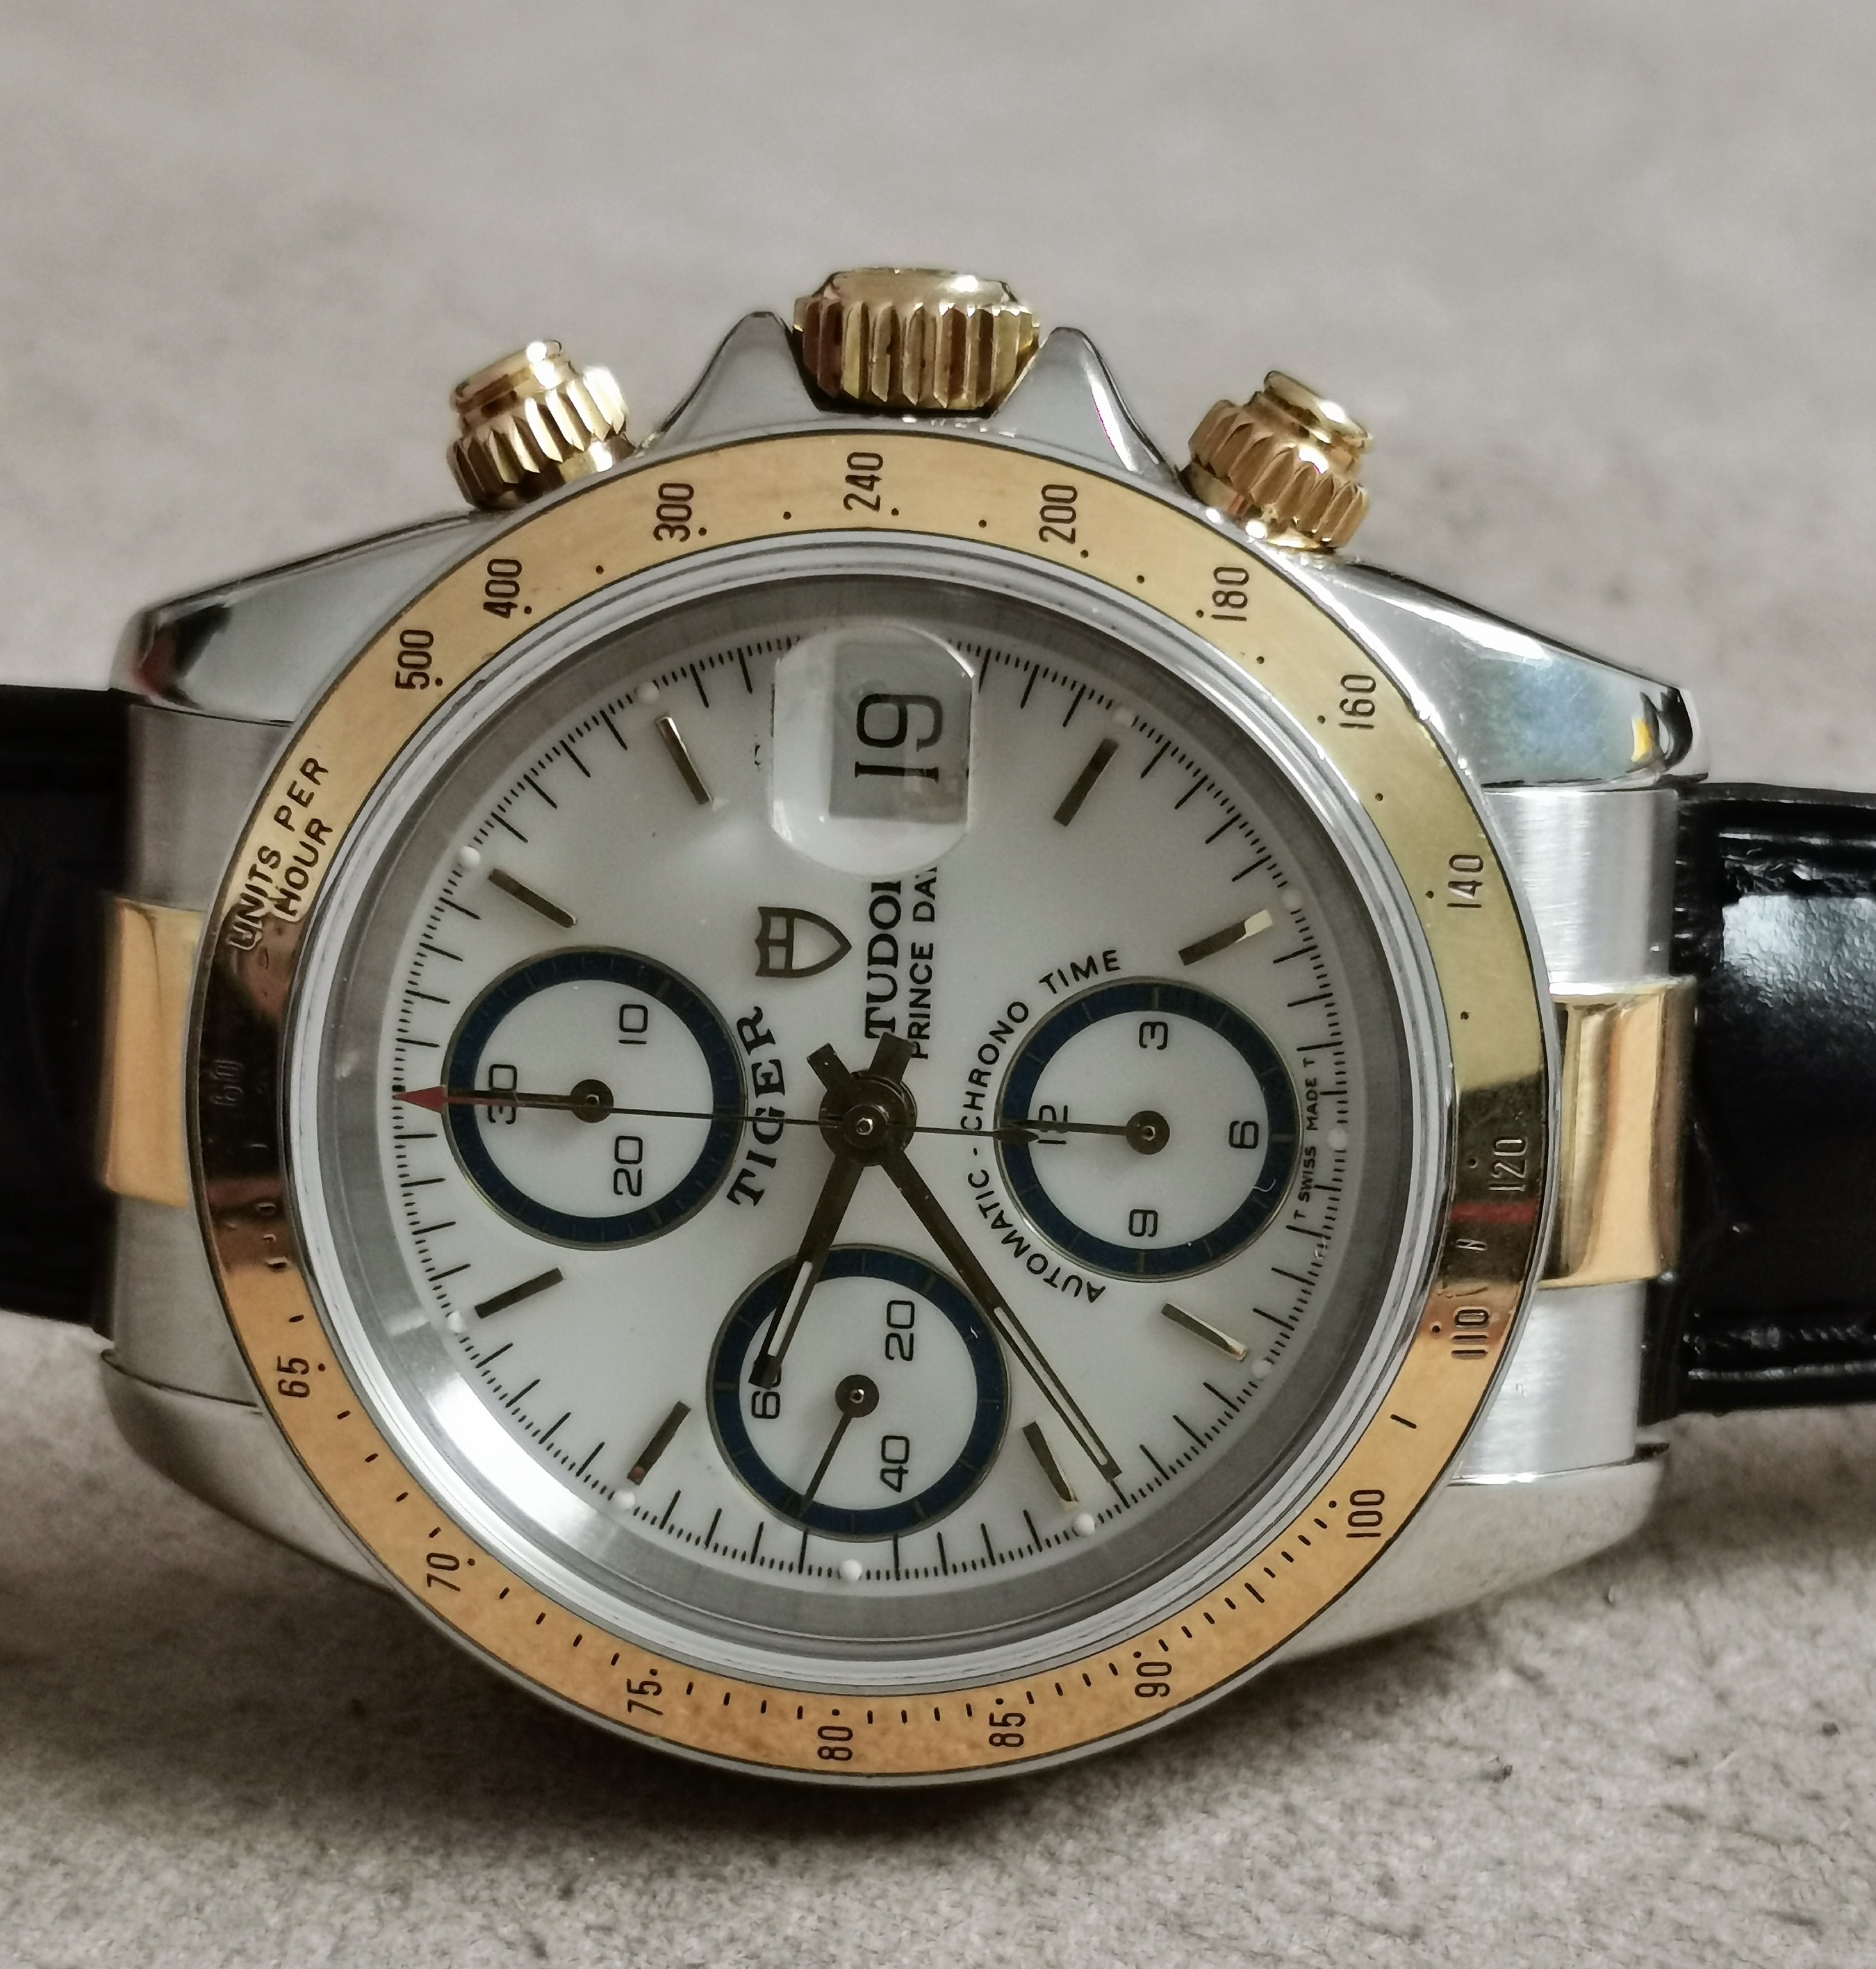 Tudor Tiger Prince Date Prince Date Tiger chrono steel and gold white dial leather deplo box and warranty 1998 | San Giorgio a Cremano